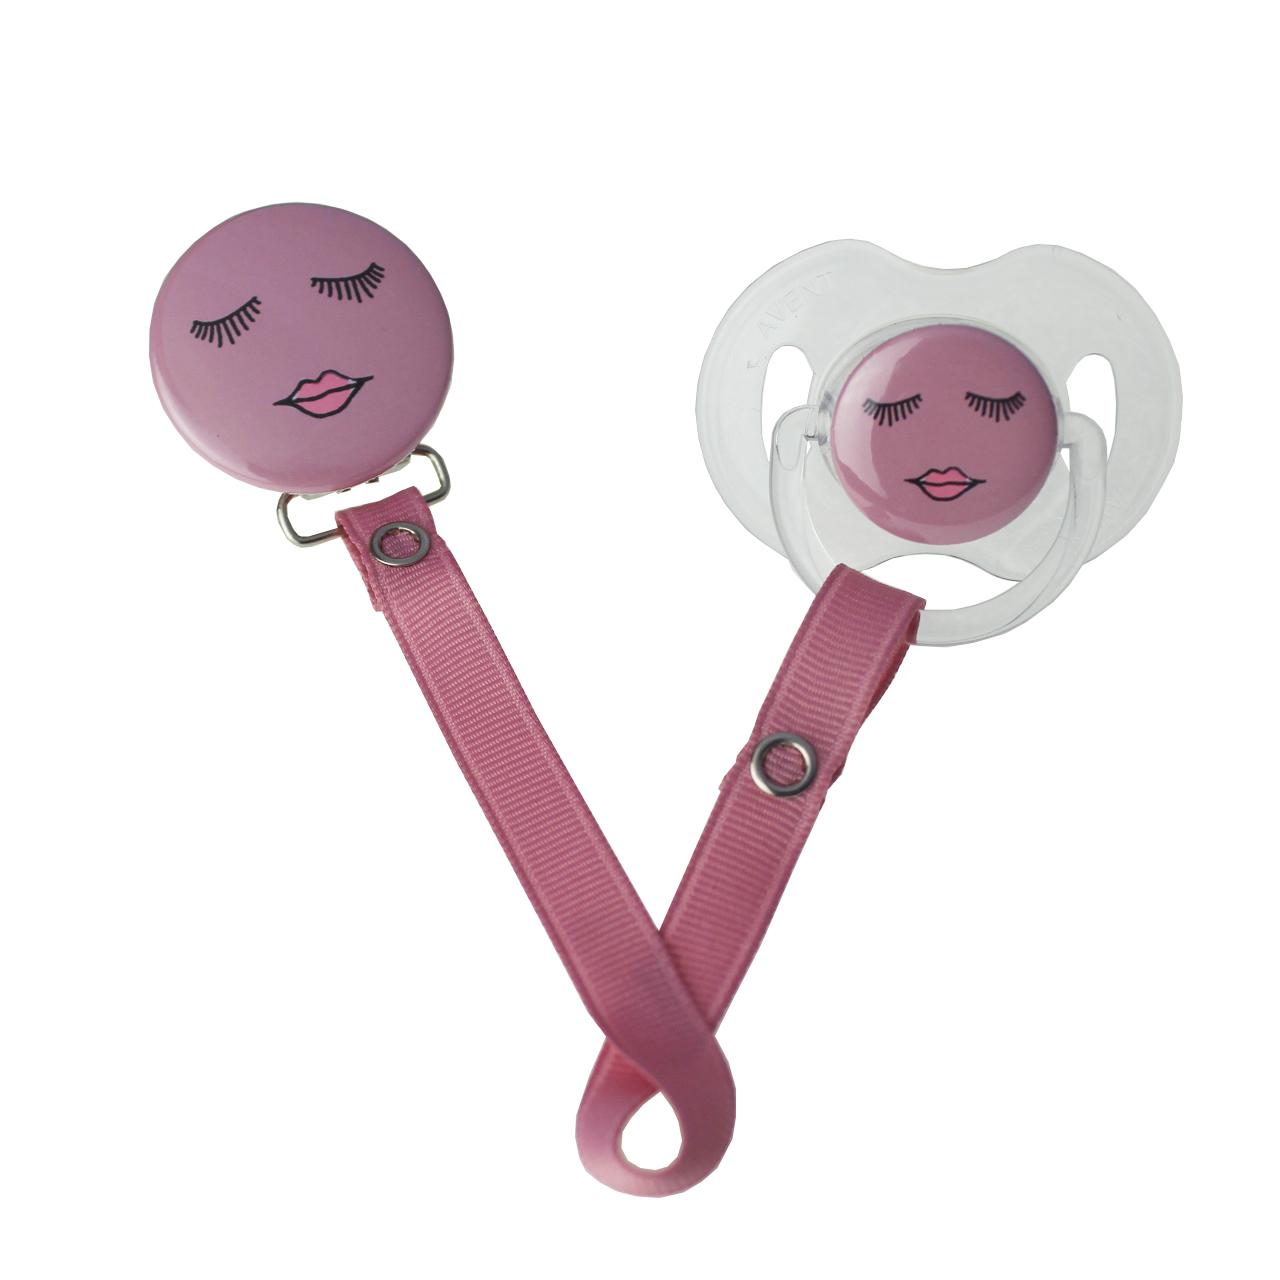 Eyes & Lip Pacifier & Clip Set